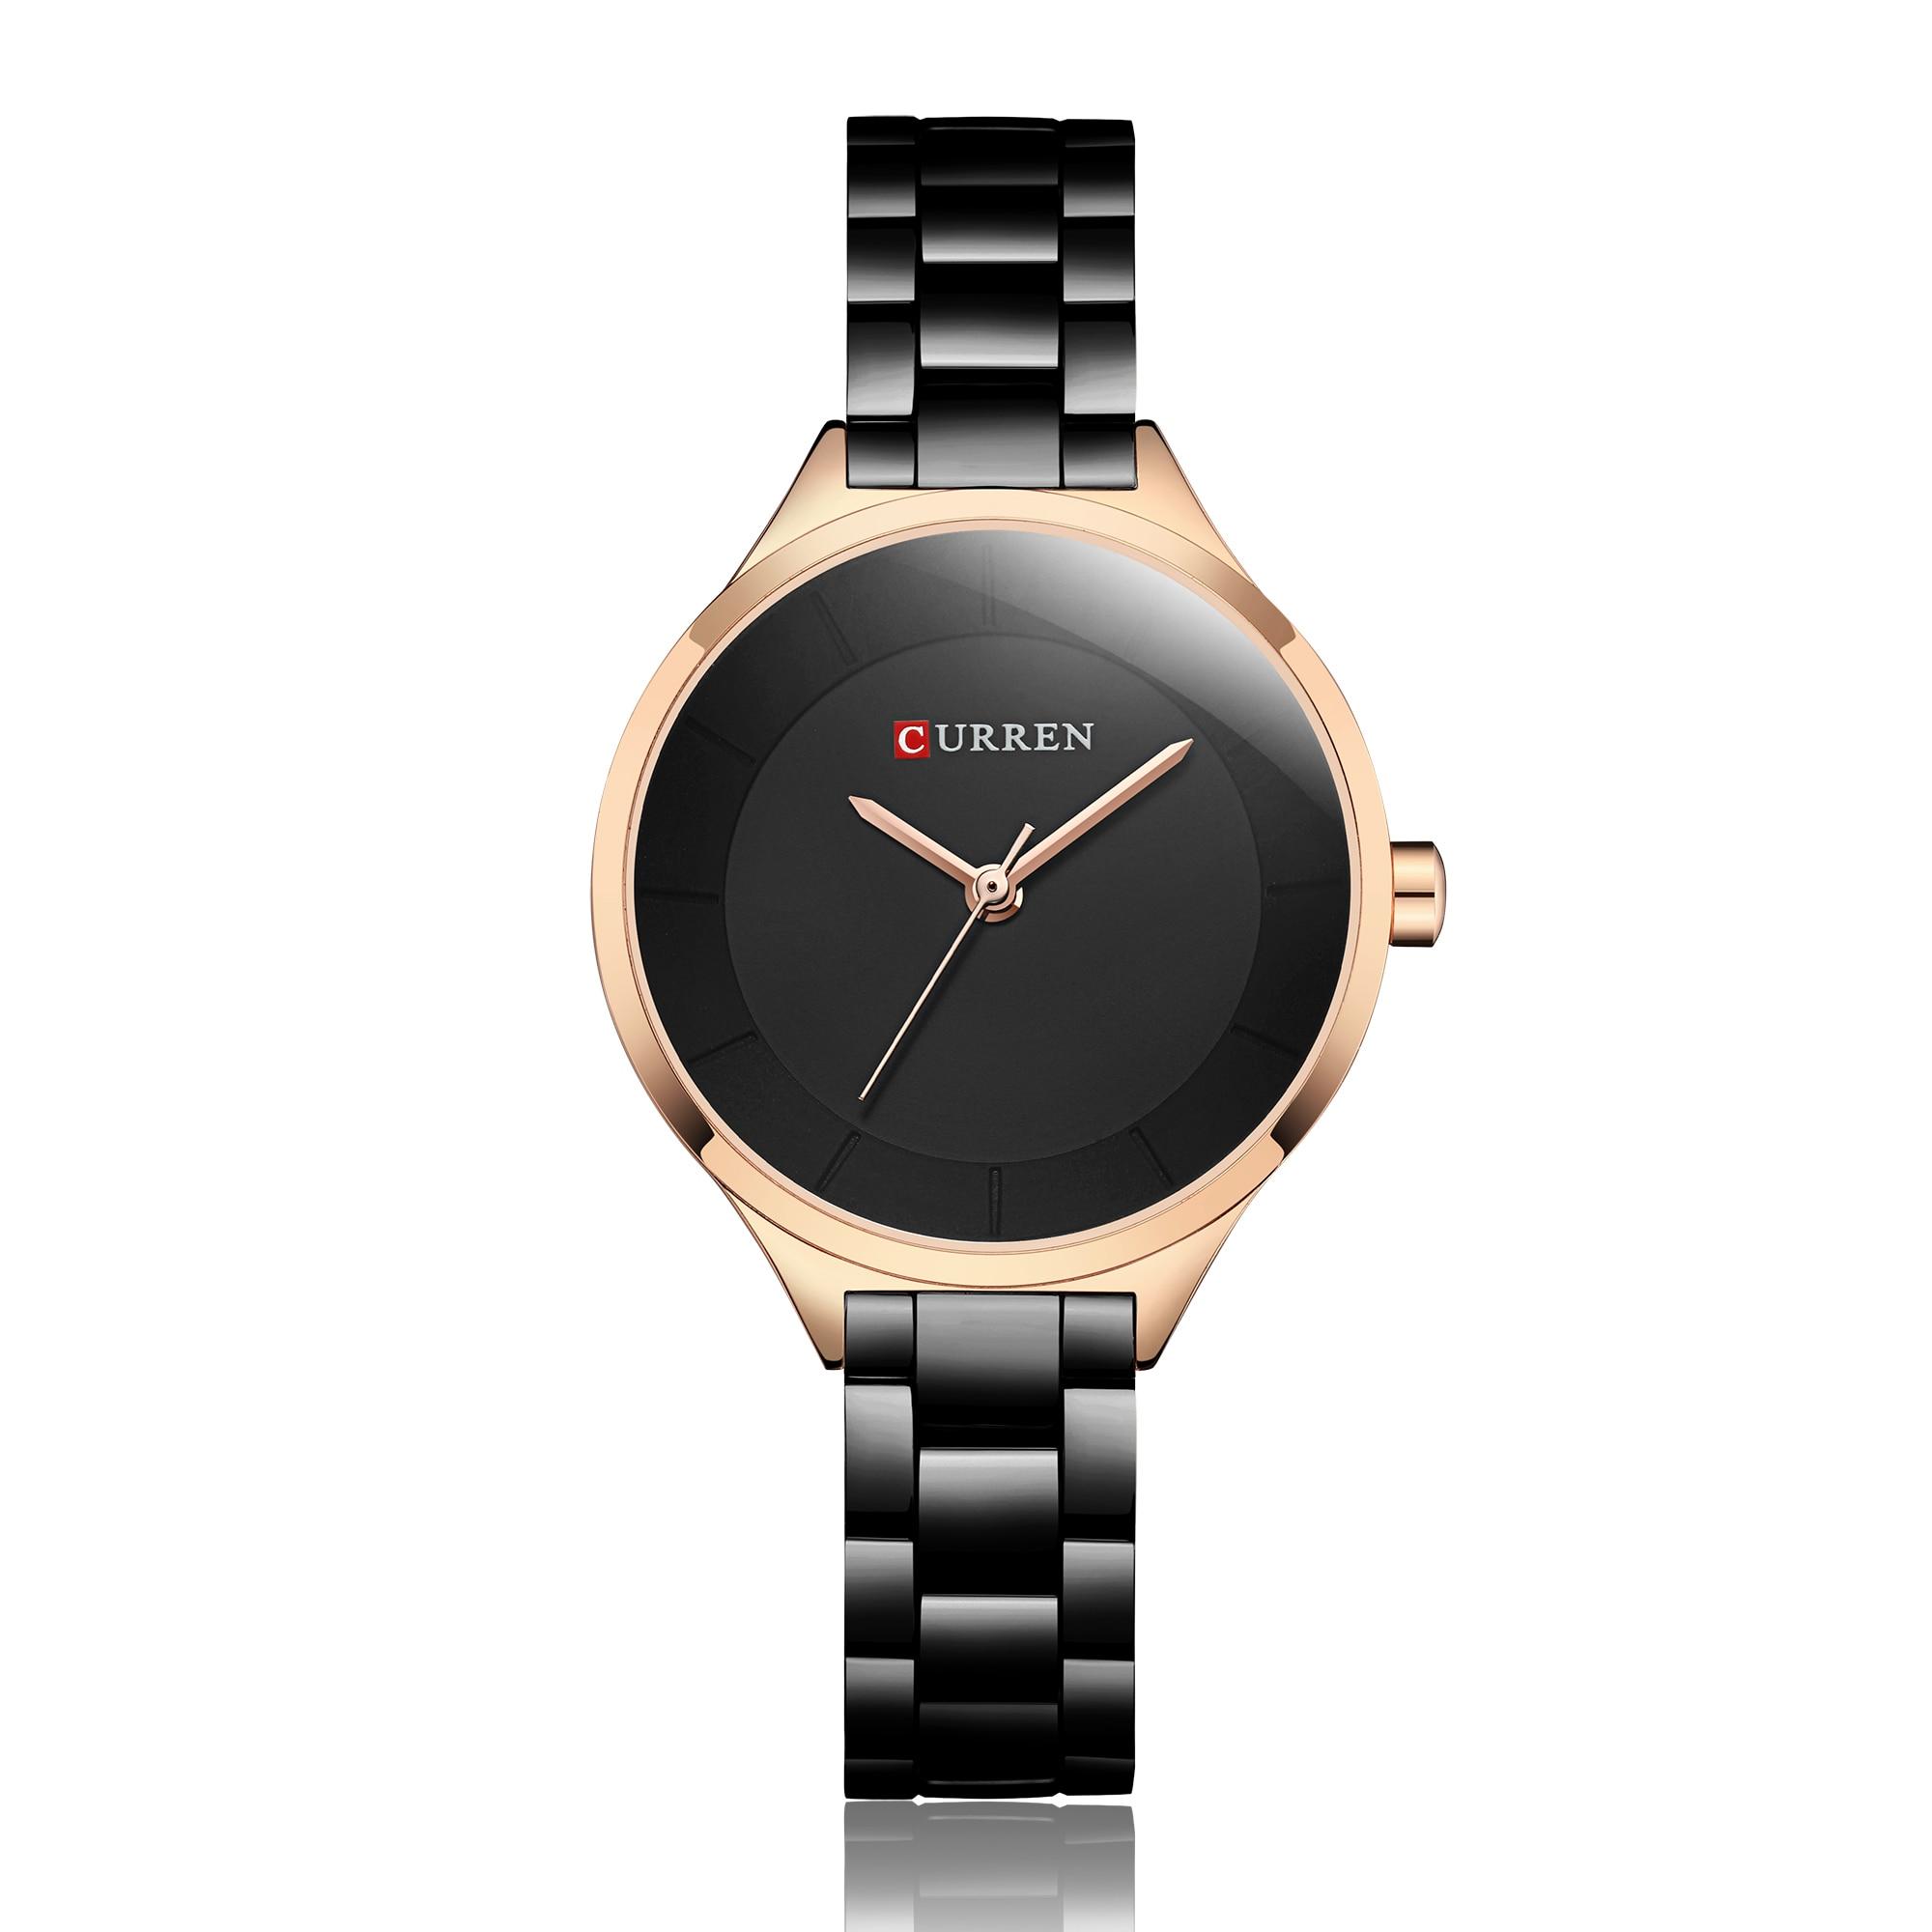 CURREN Woman's Watch Luxury Zegarek Damski Simplicity Modern Quartz Watches Black Stainless Steel Waterproof Montre Femme 2019 enlarge